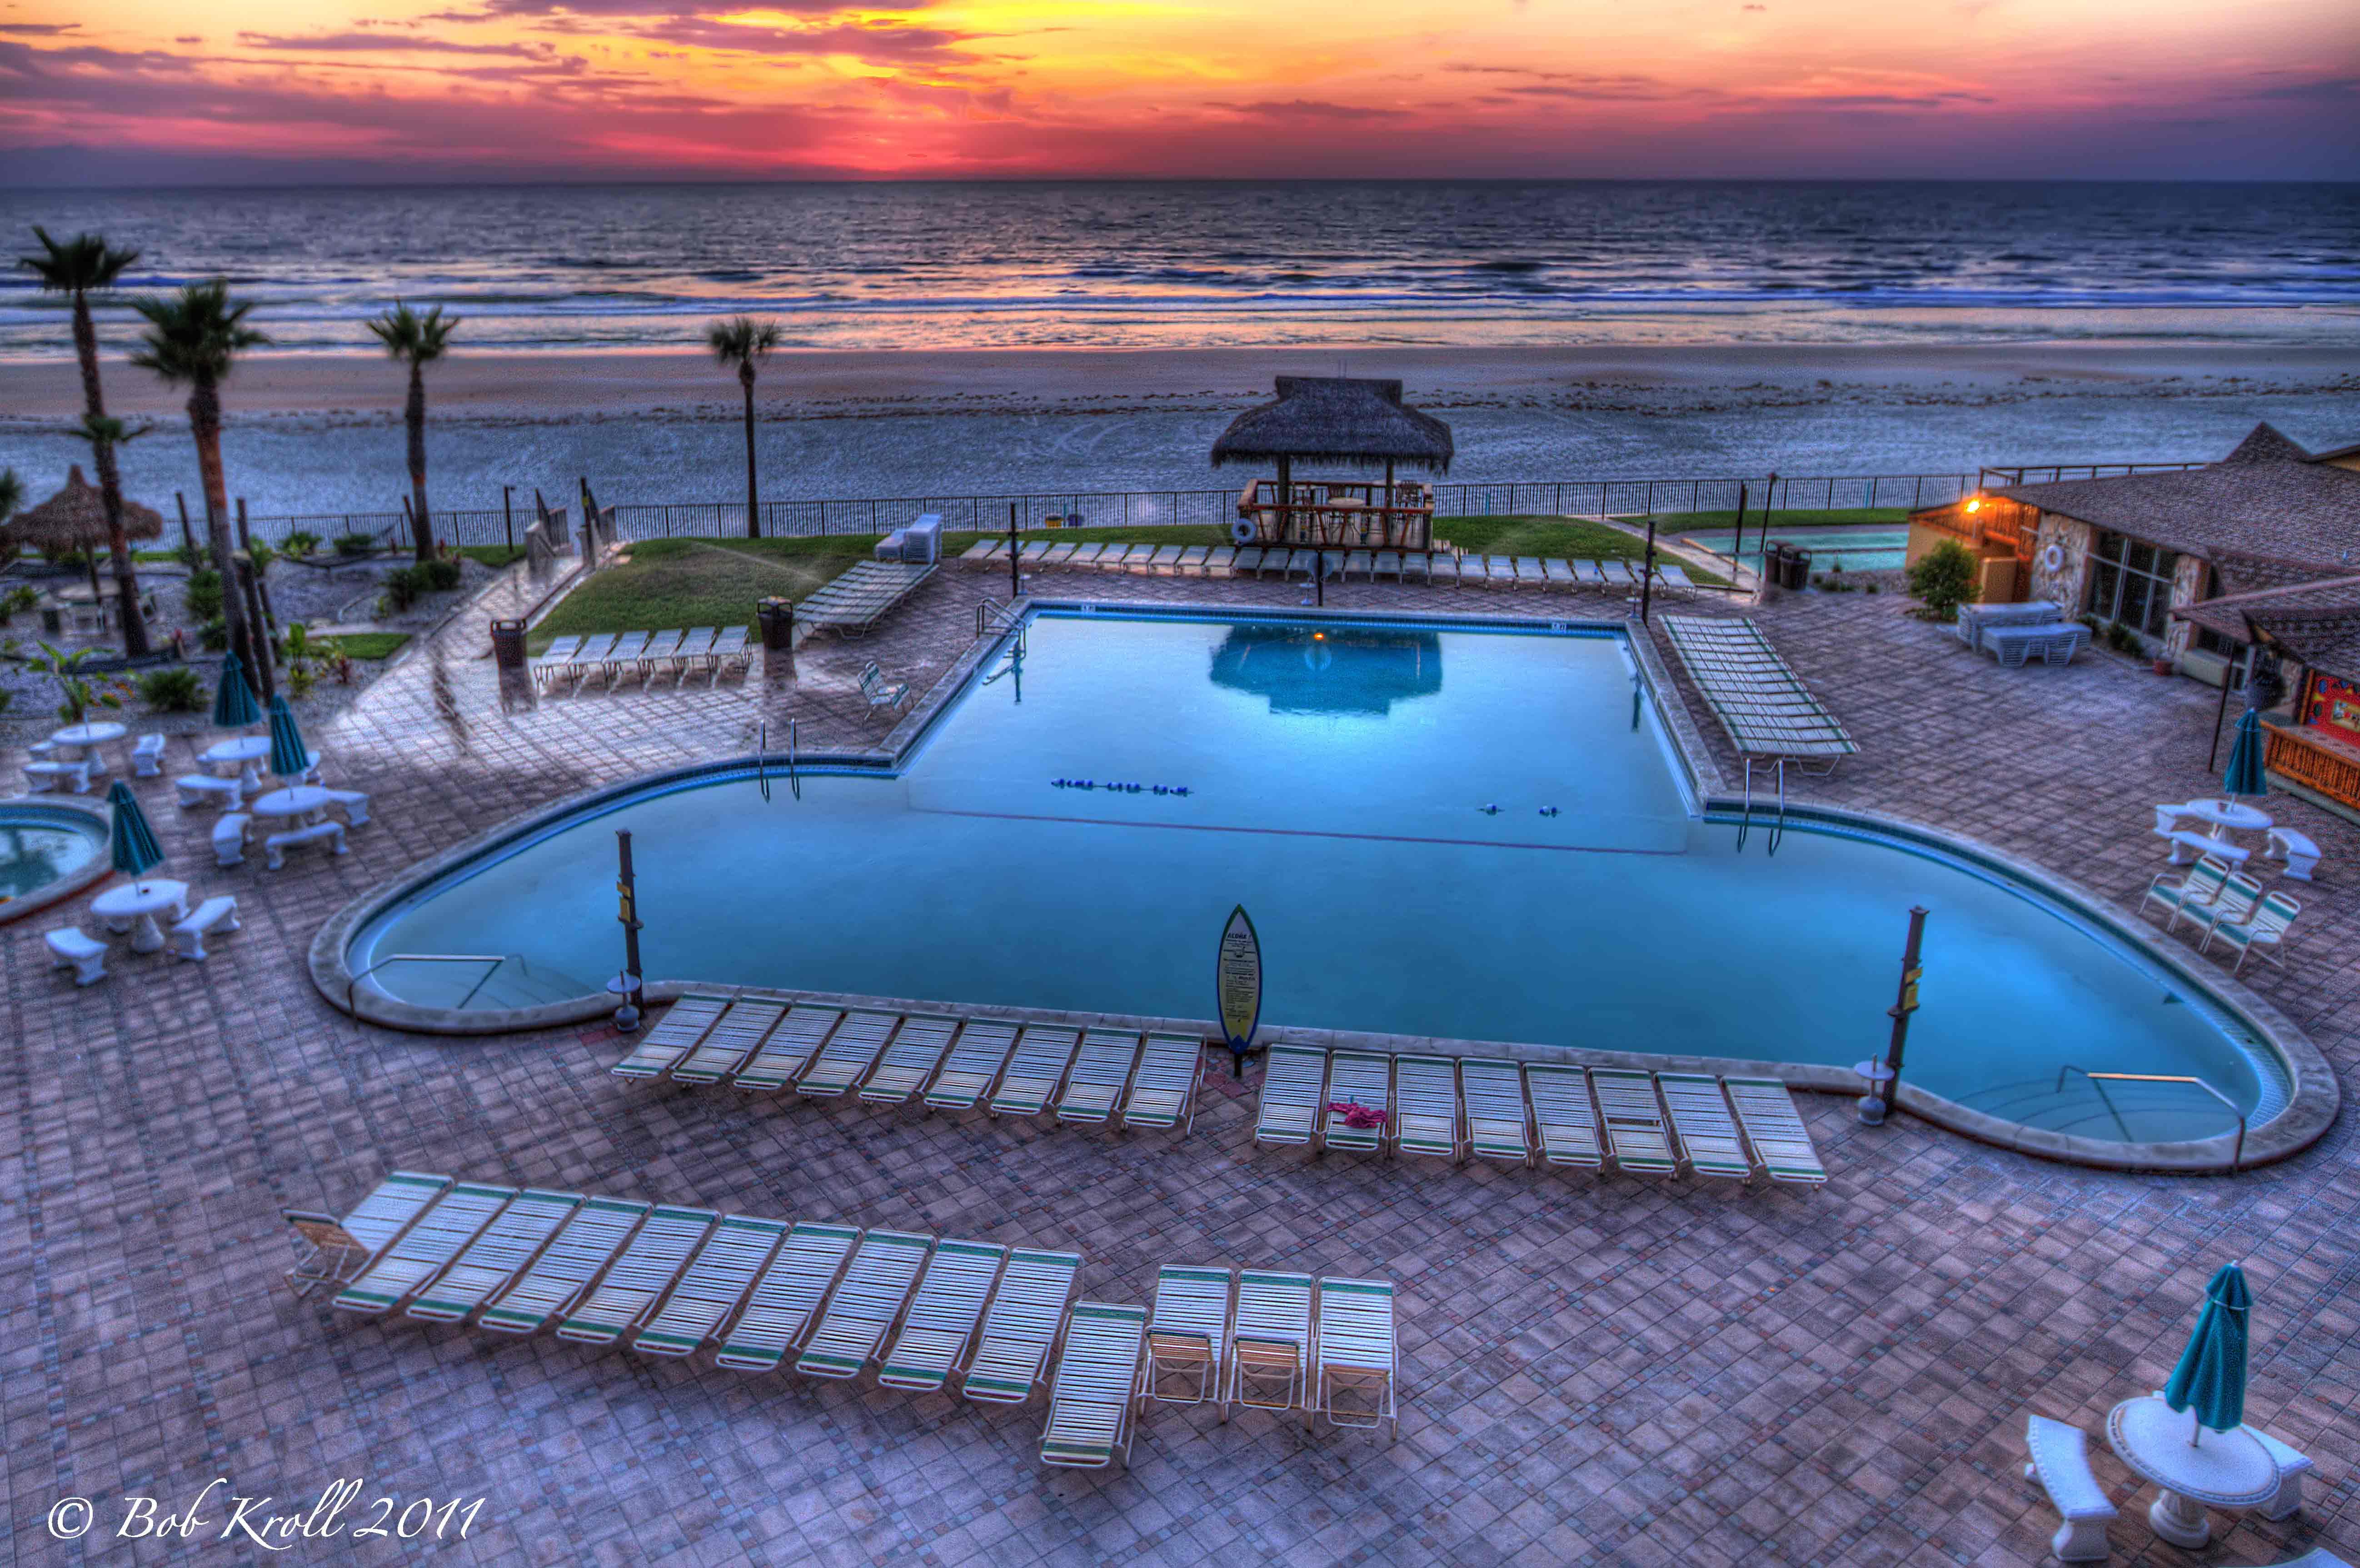 Pool At The Hawaiian Inn Resort In Daytona Beach Florida 4494 Views